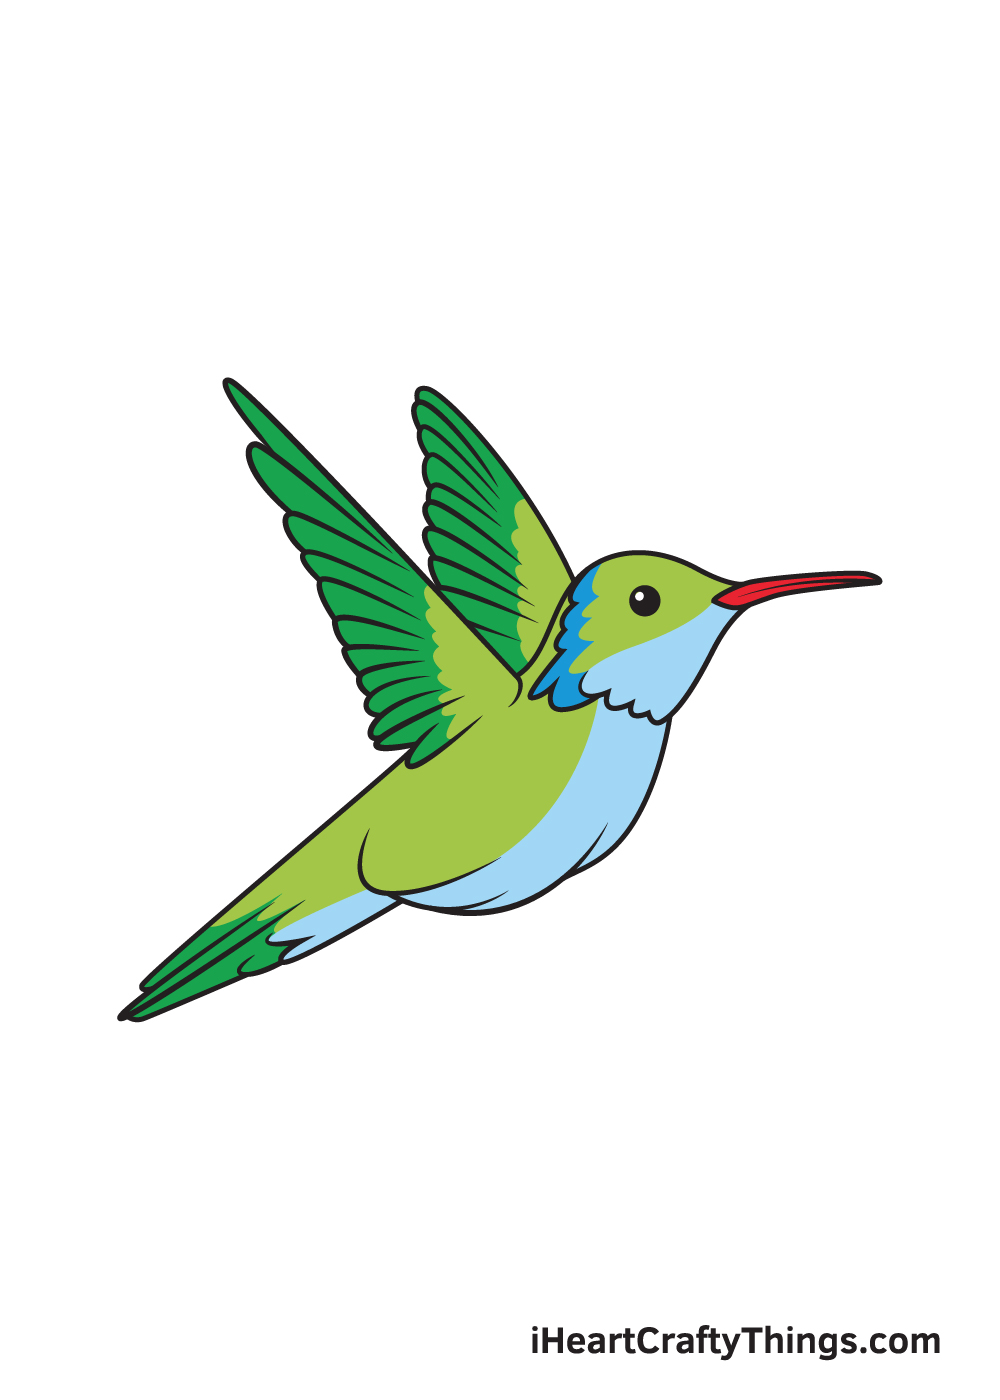 hummingbird drawing 9 steps